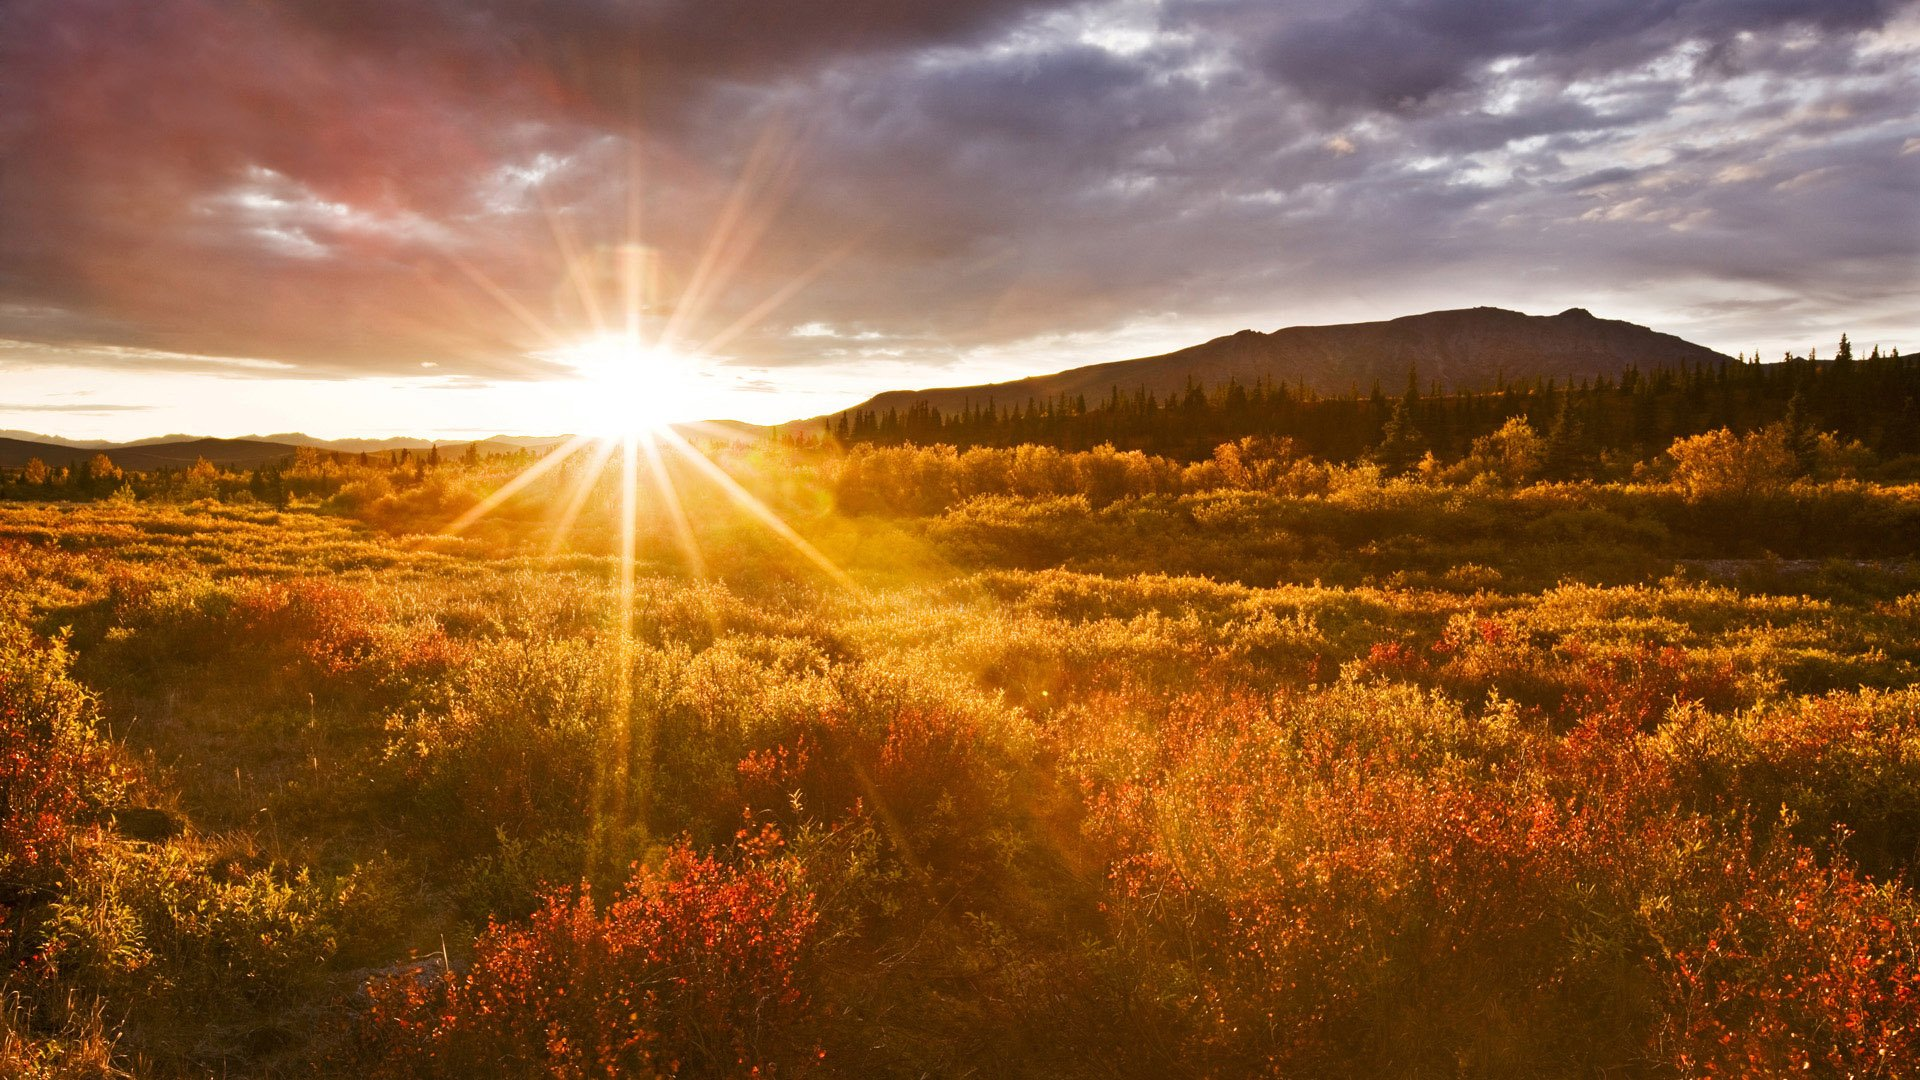 Sunrise Wallpaper Download HD 1920x1080